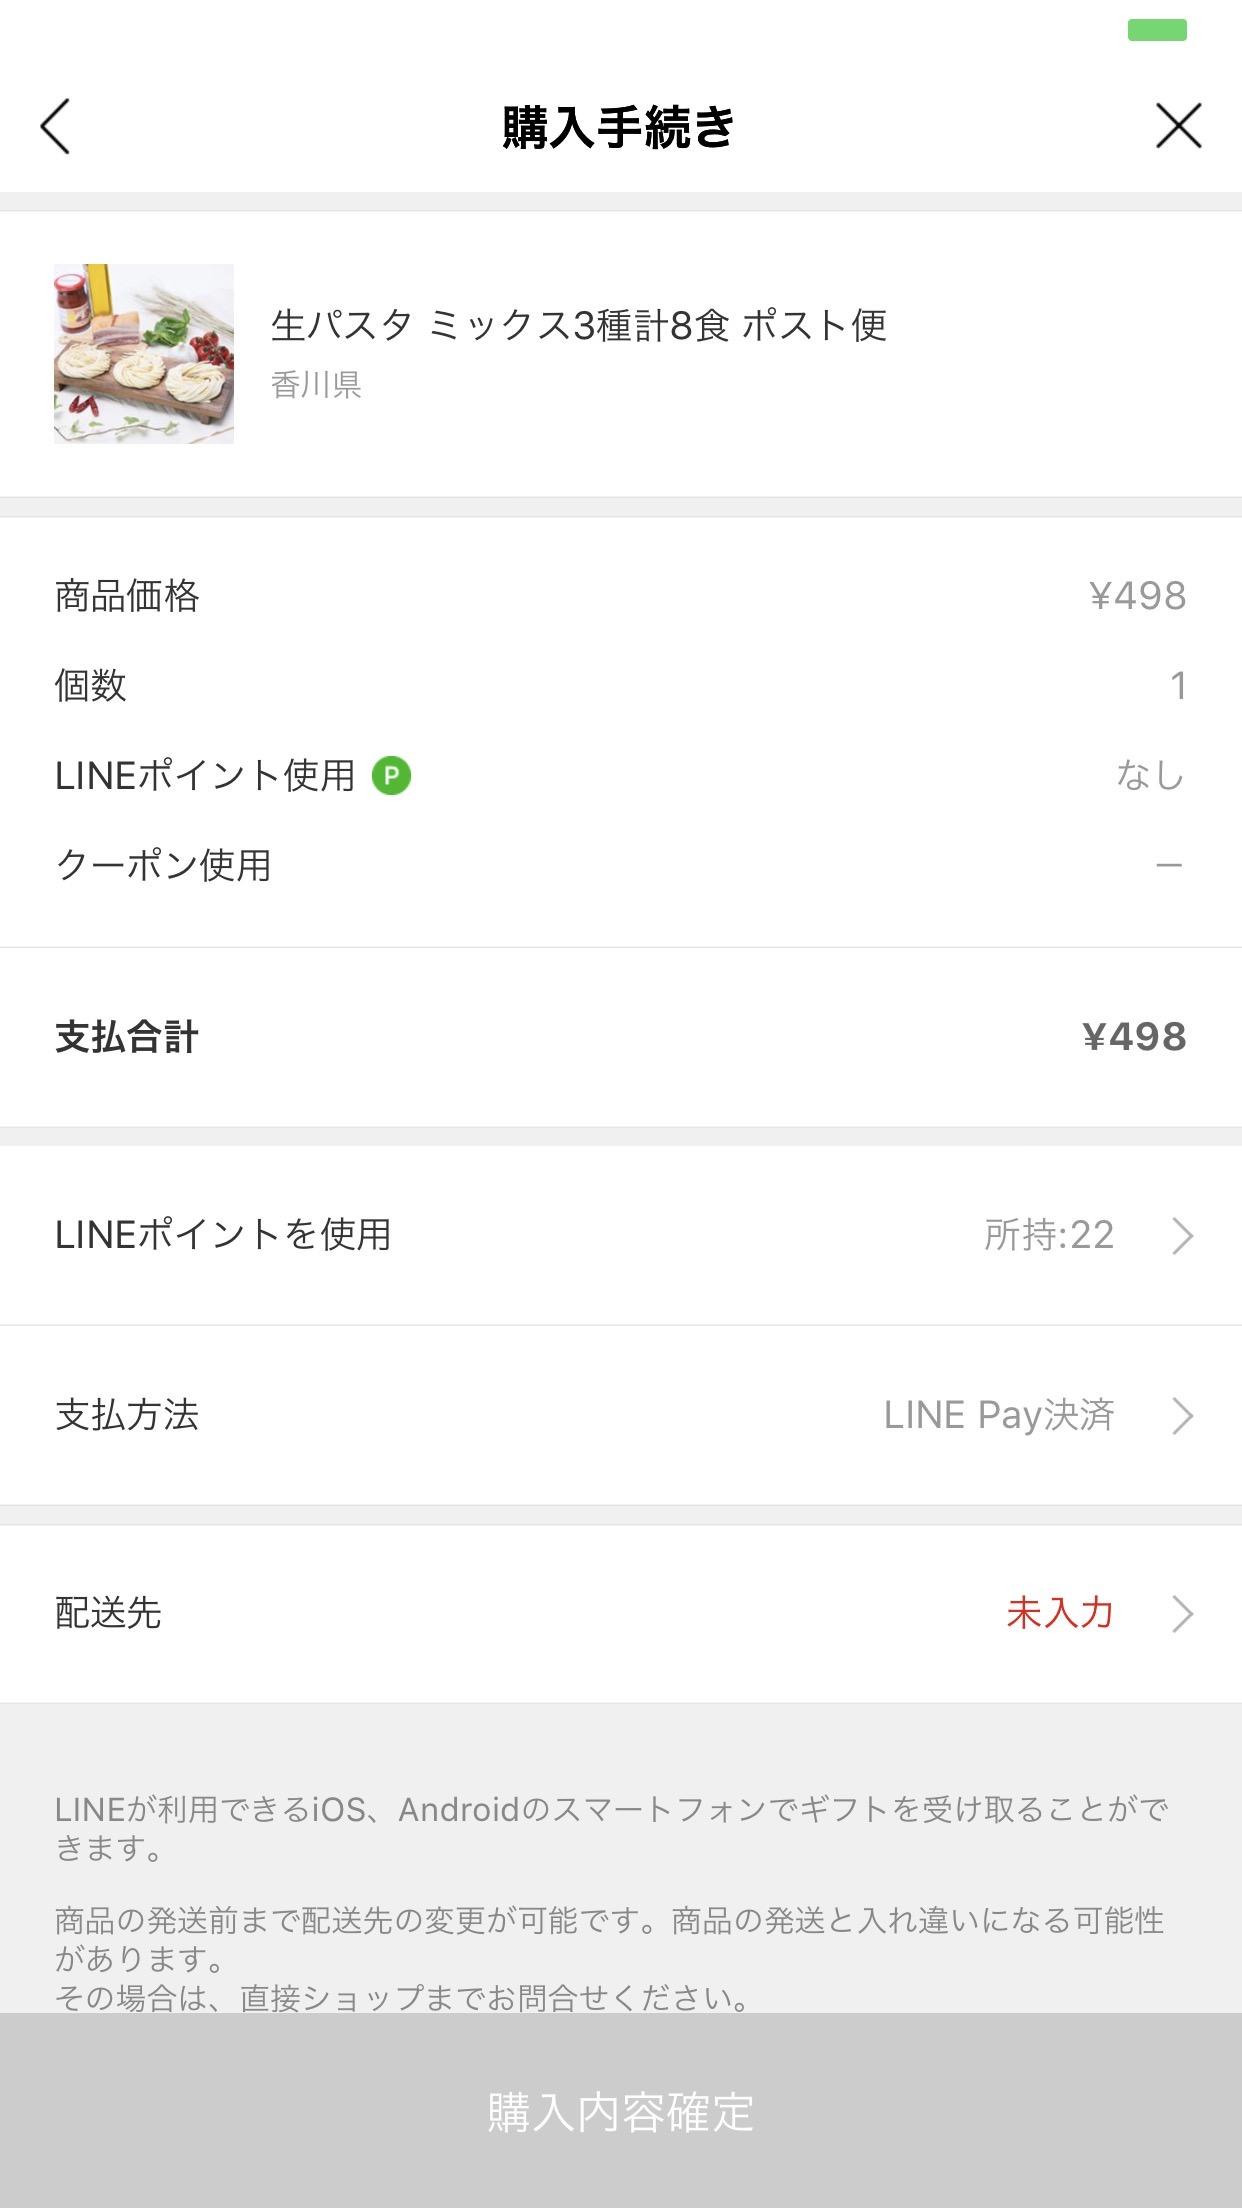 「LINEギフト」を購入する 3